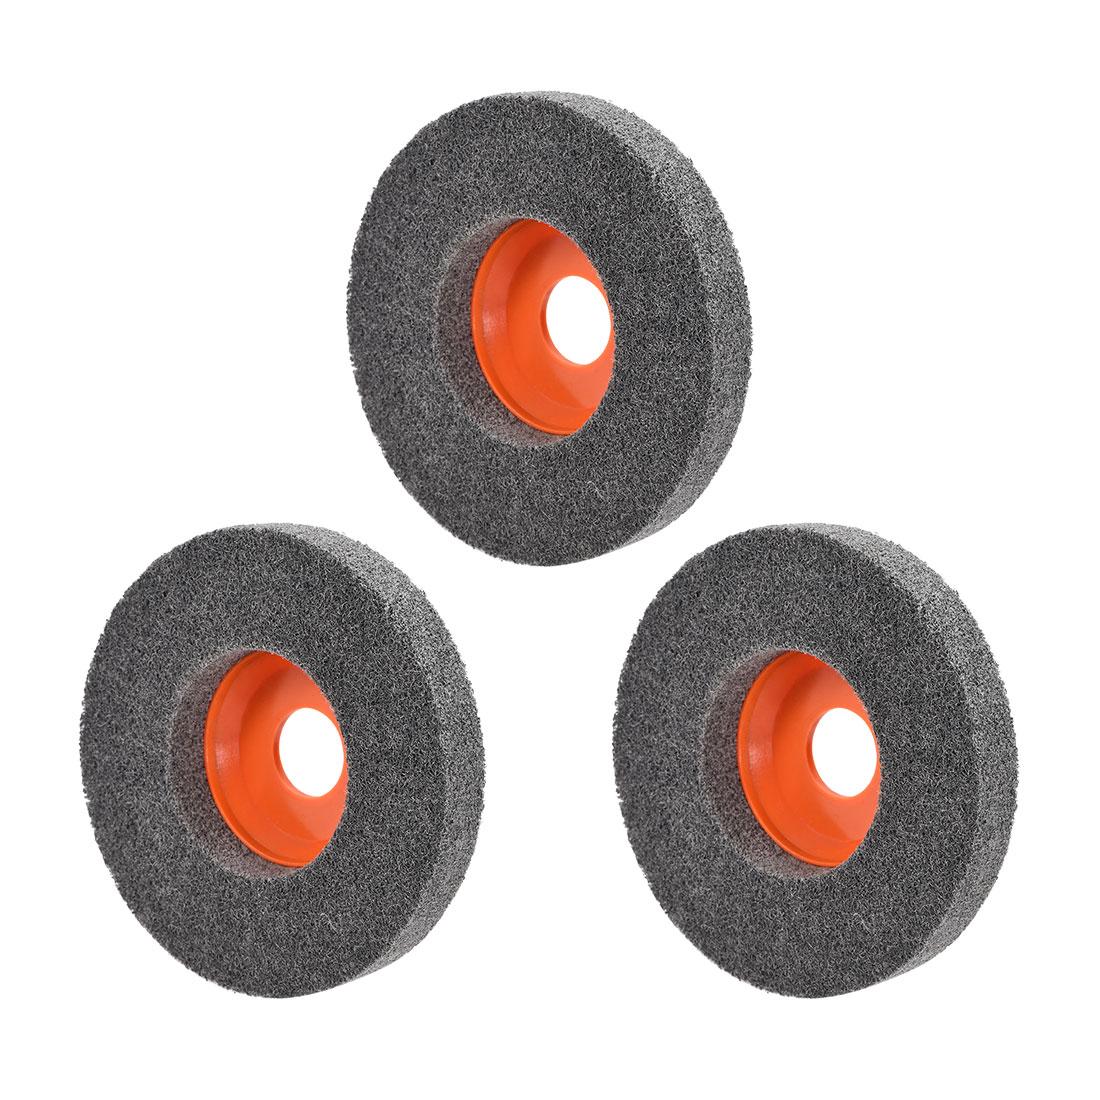 4.5 Inch Polishing Wheel Buffing Pad Disc for 100 Angle Grinders Orange 3pcs